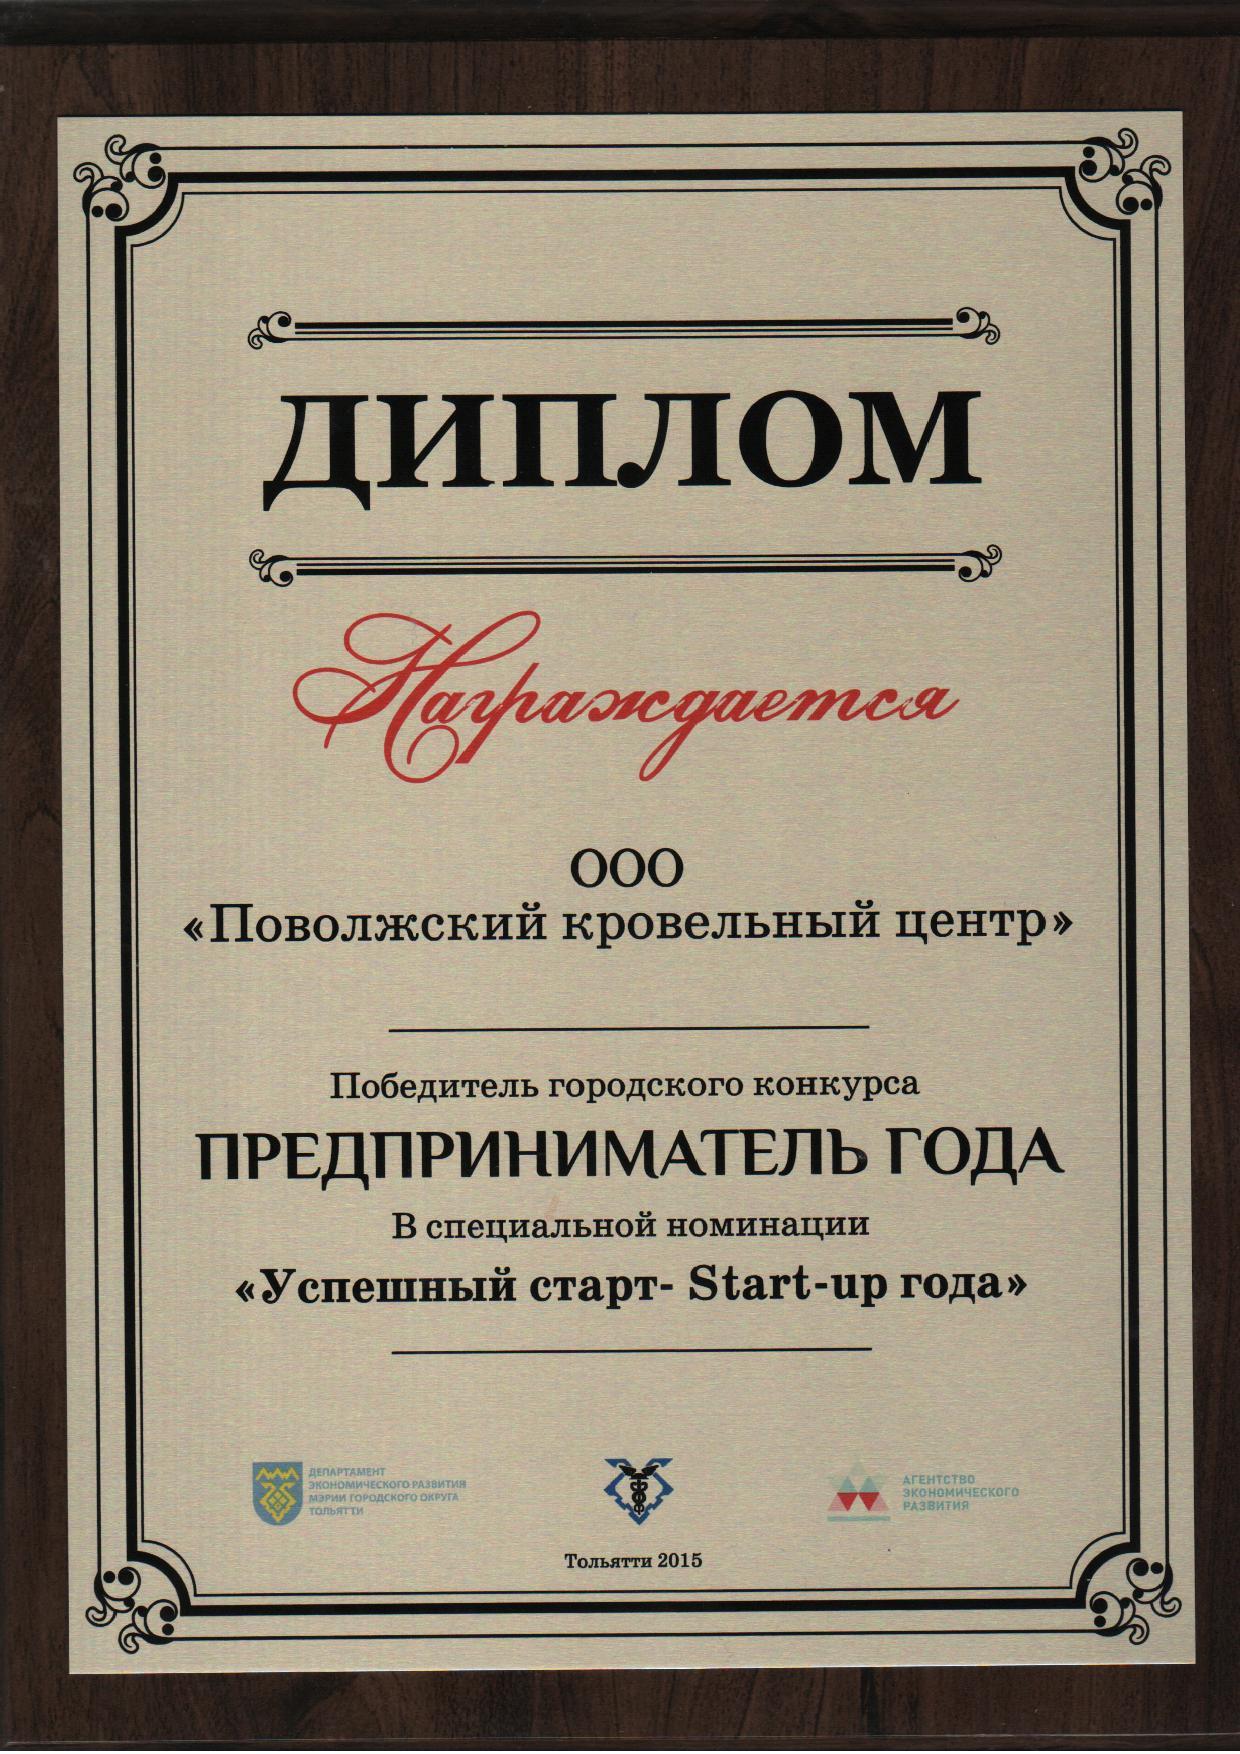 пленка армированная 200 гр кв м